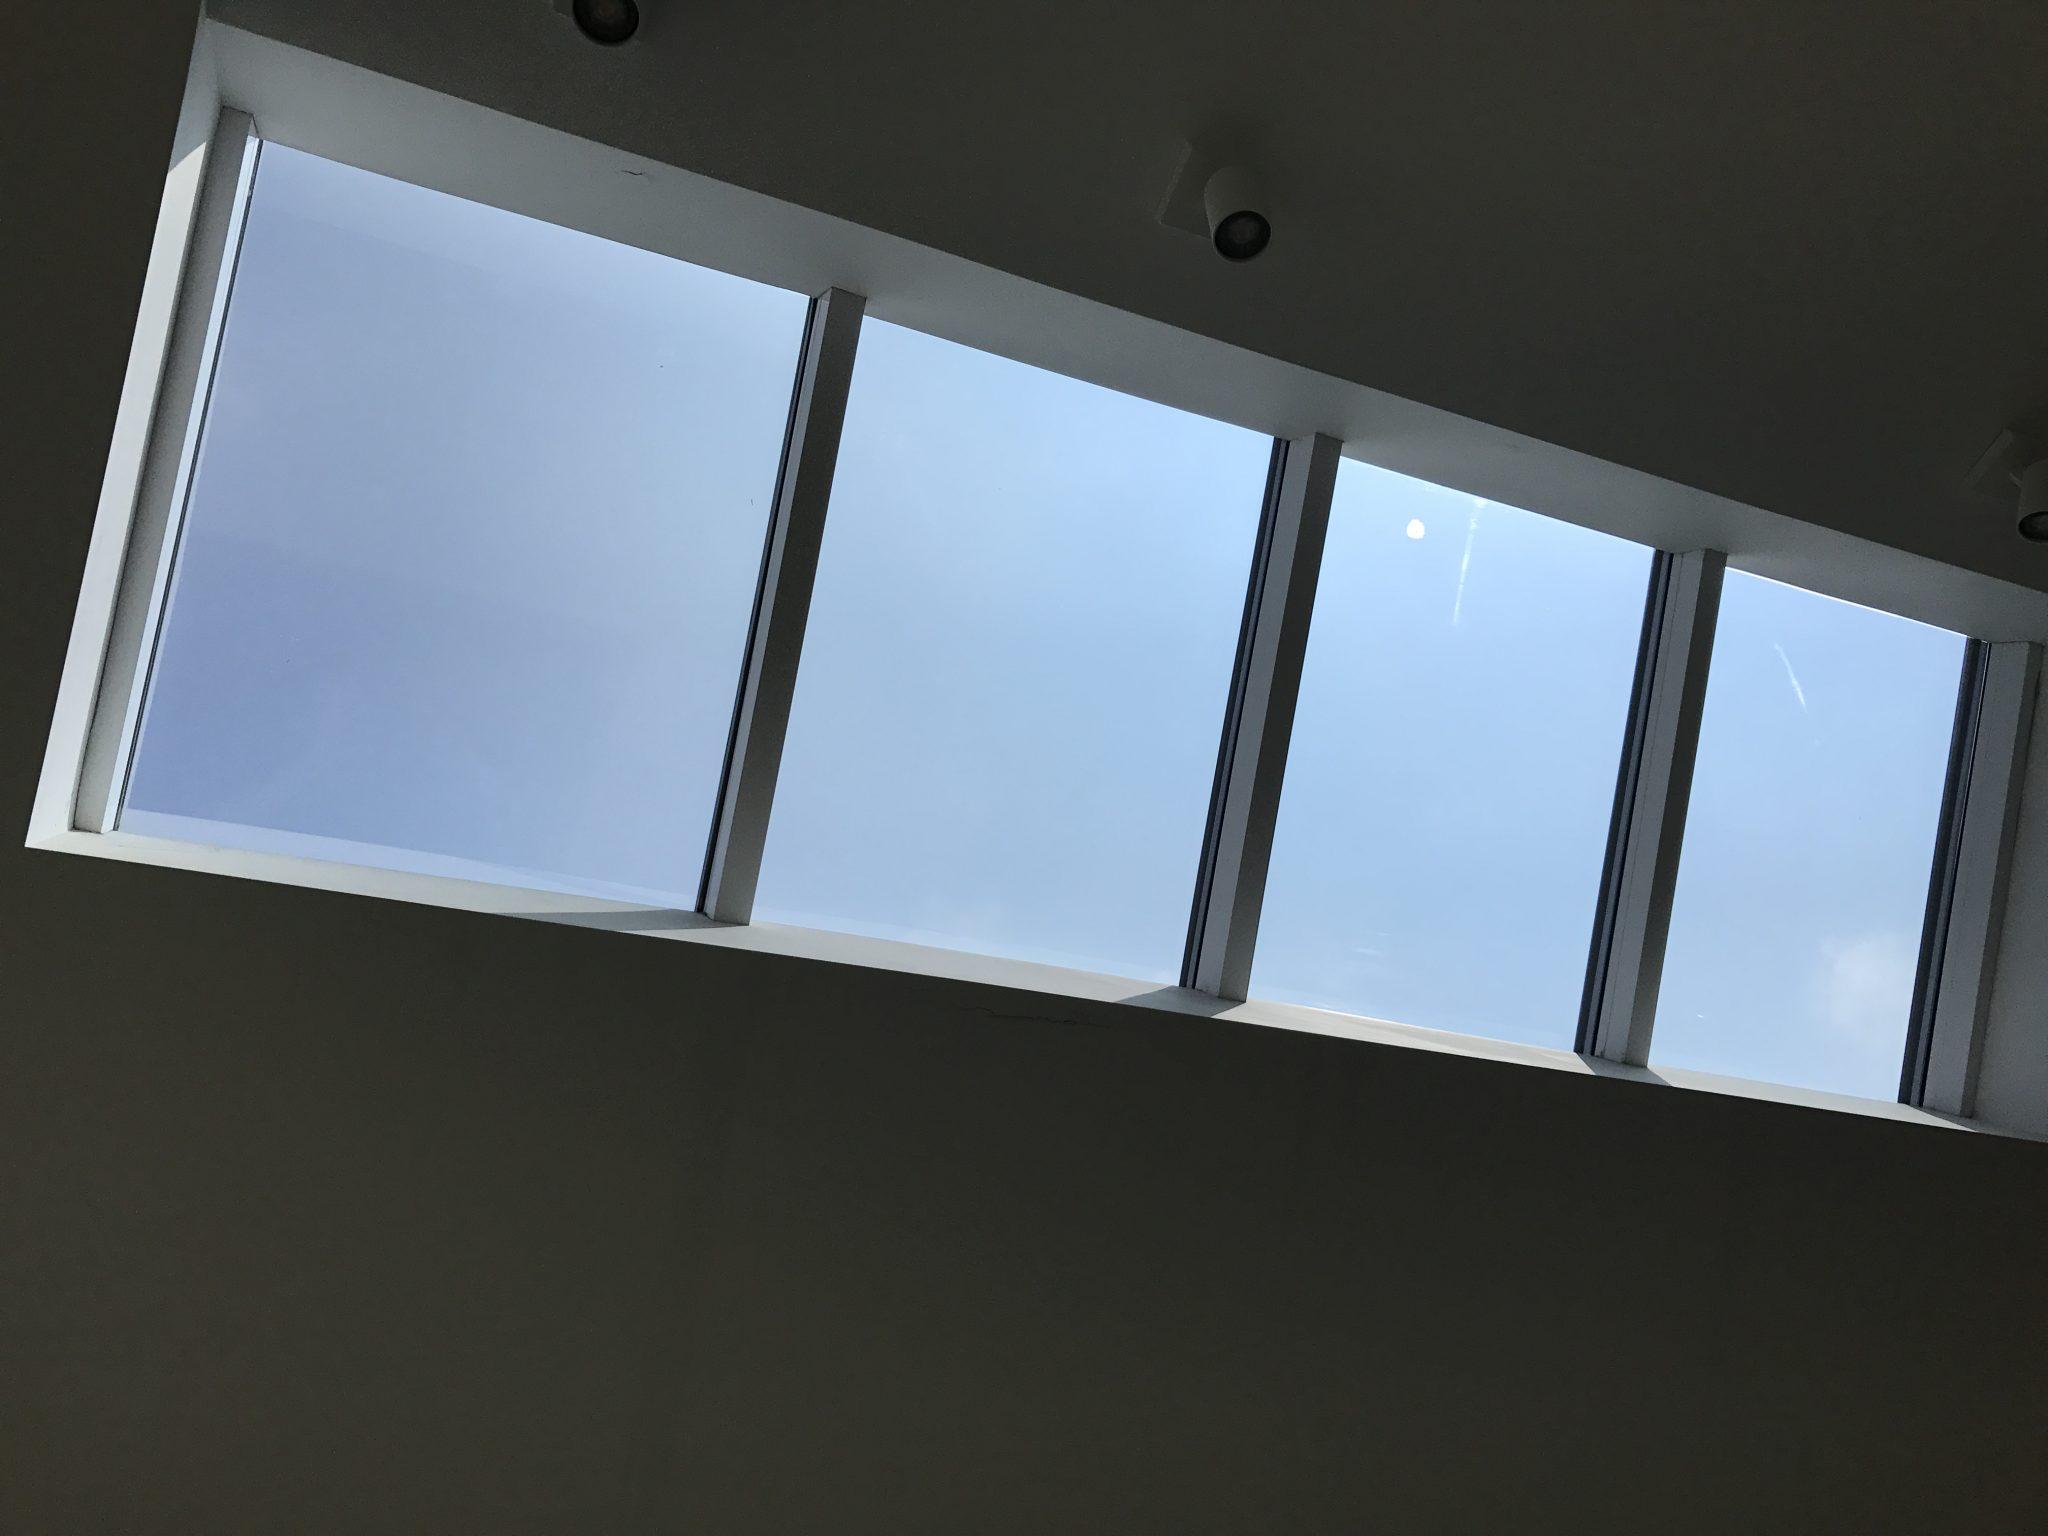 Perlite Window Tinting Skylights Installed